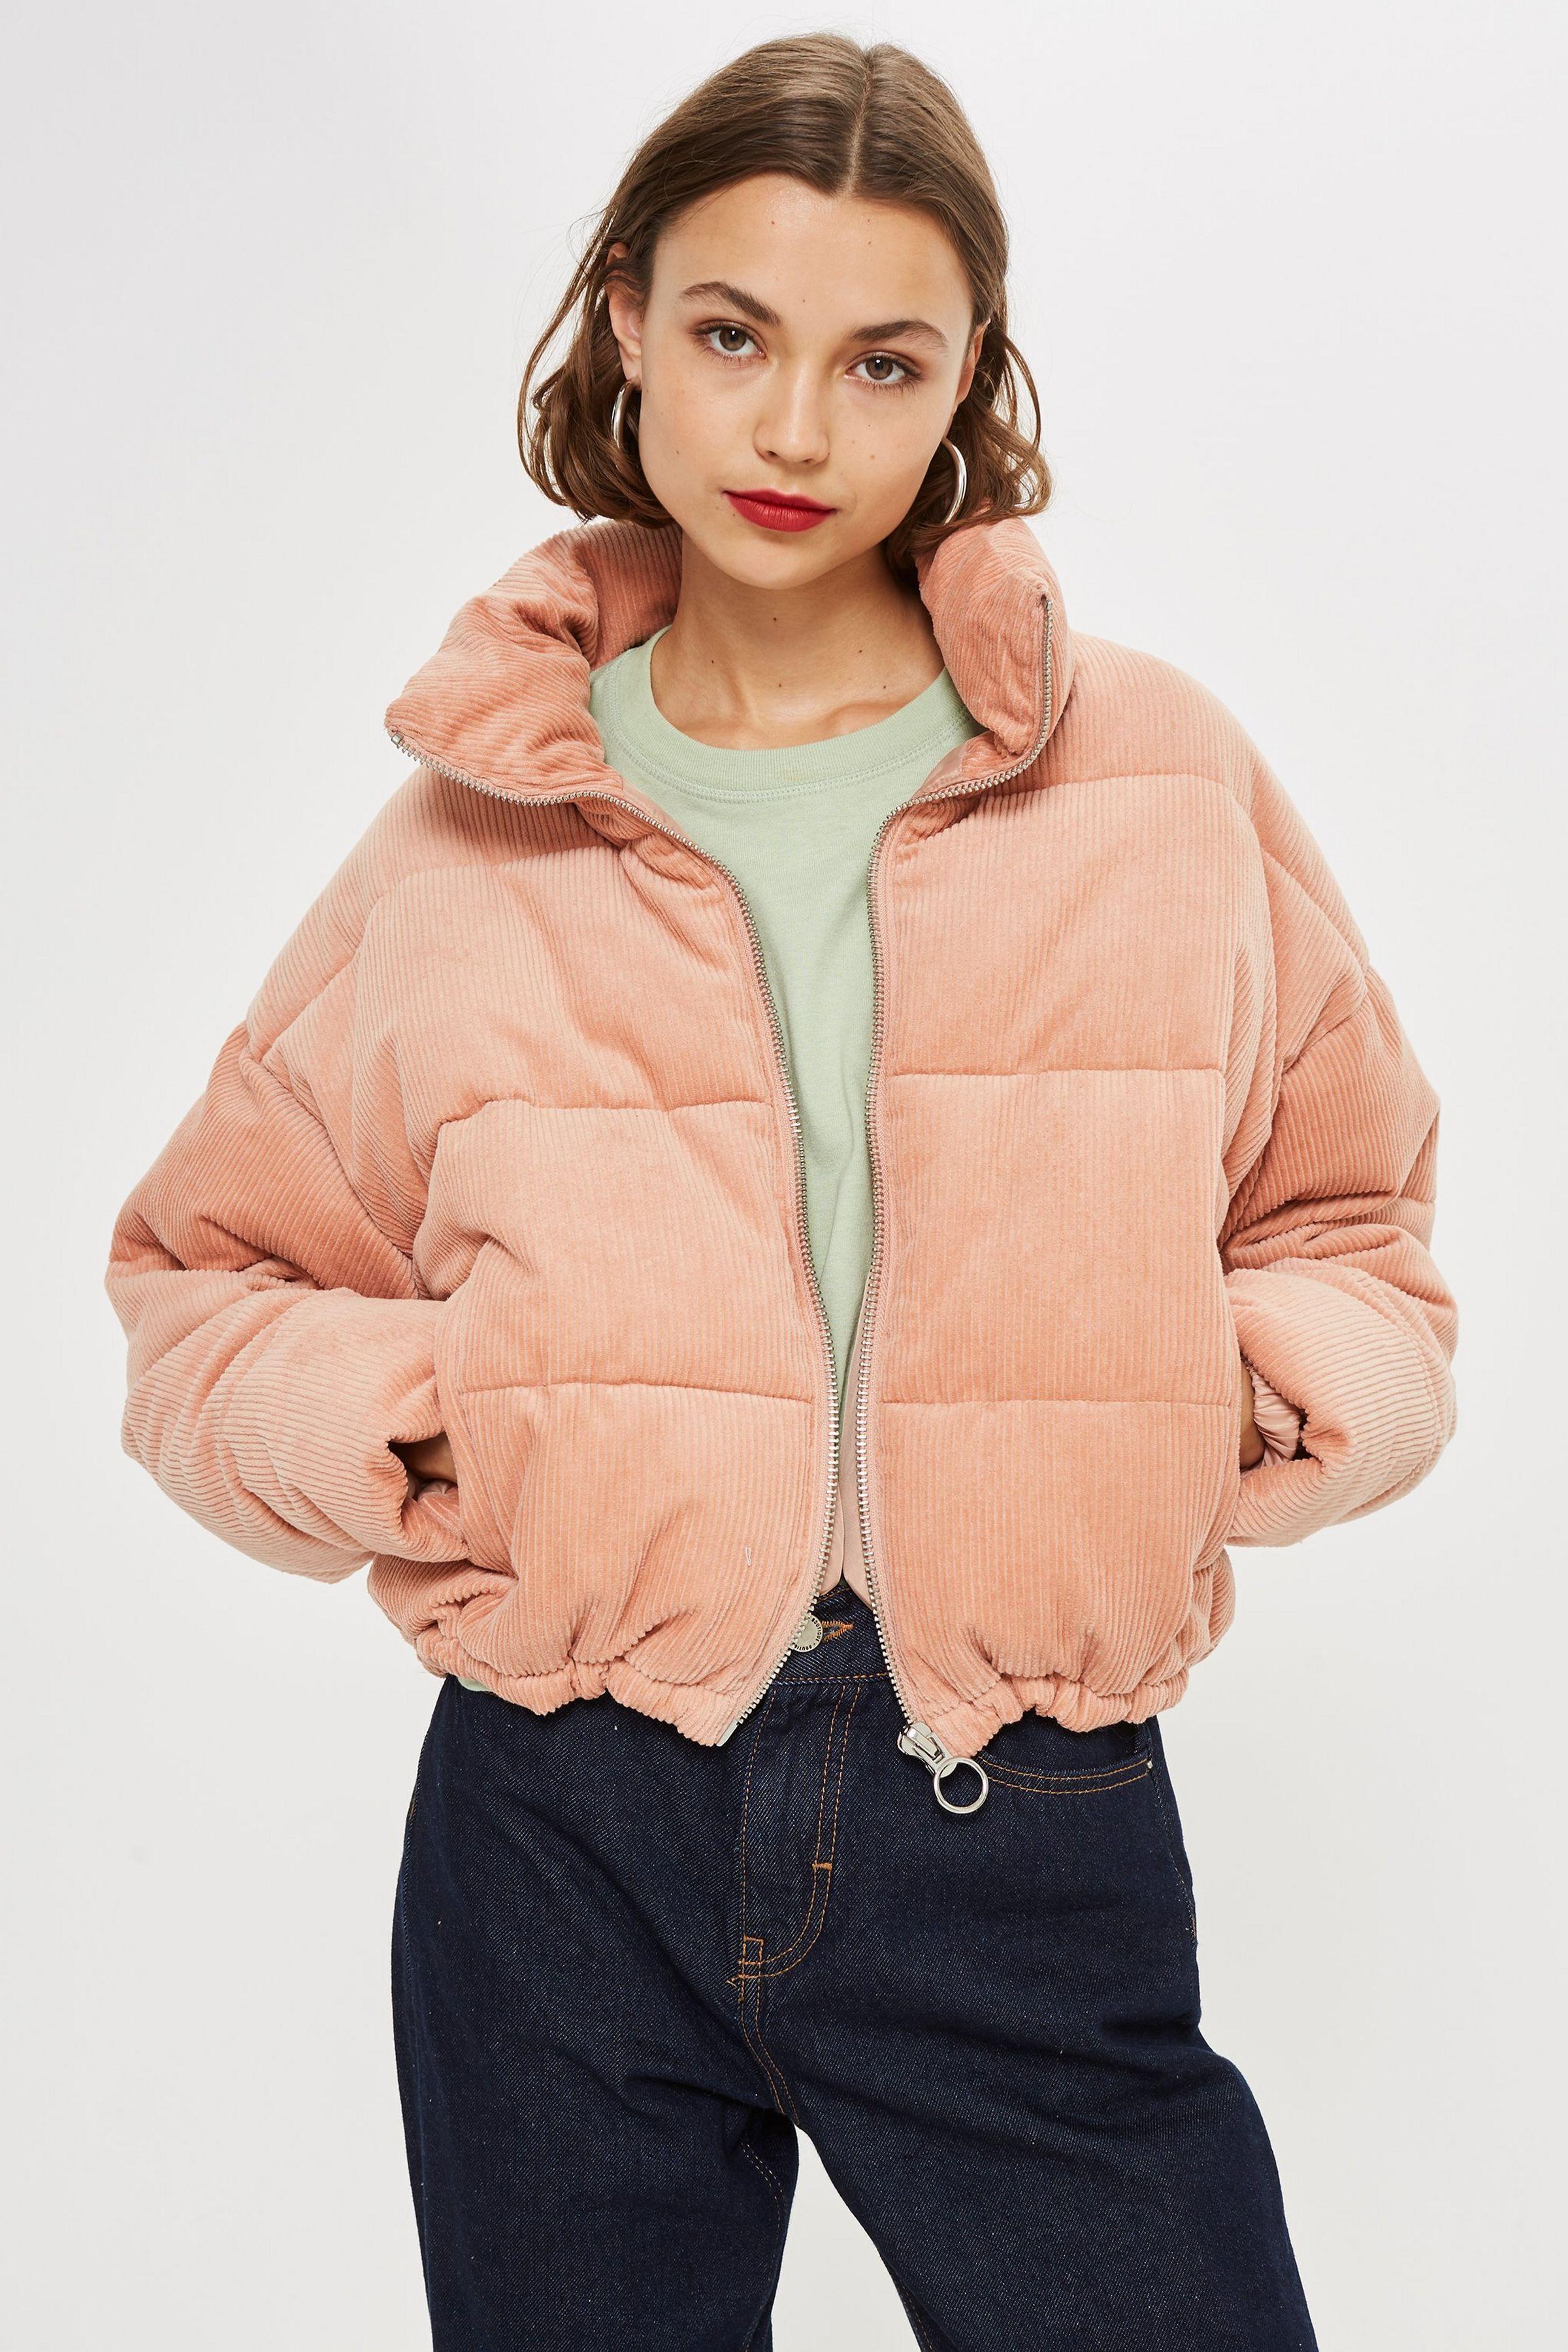 TALL Corduroy Puffer Jacket Puffy jacket outfit, Fashion